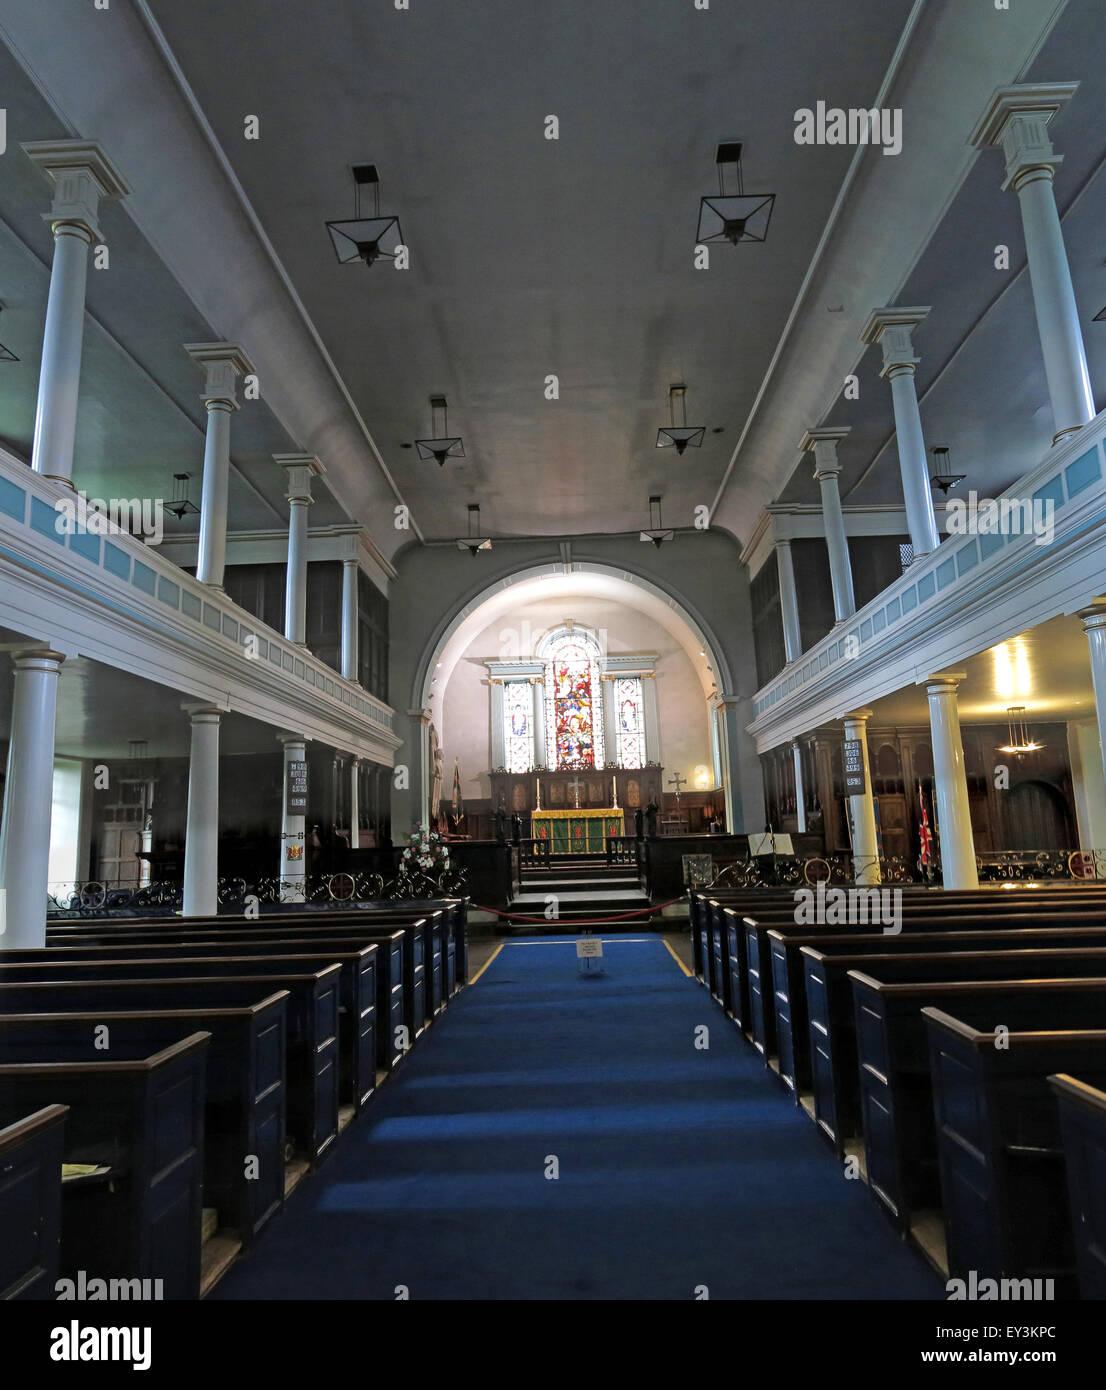 St Cuthberts Church,Carlisle,Cumbria,England,UK interior - Stock Image